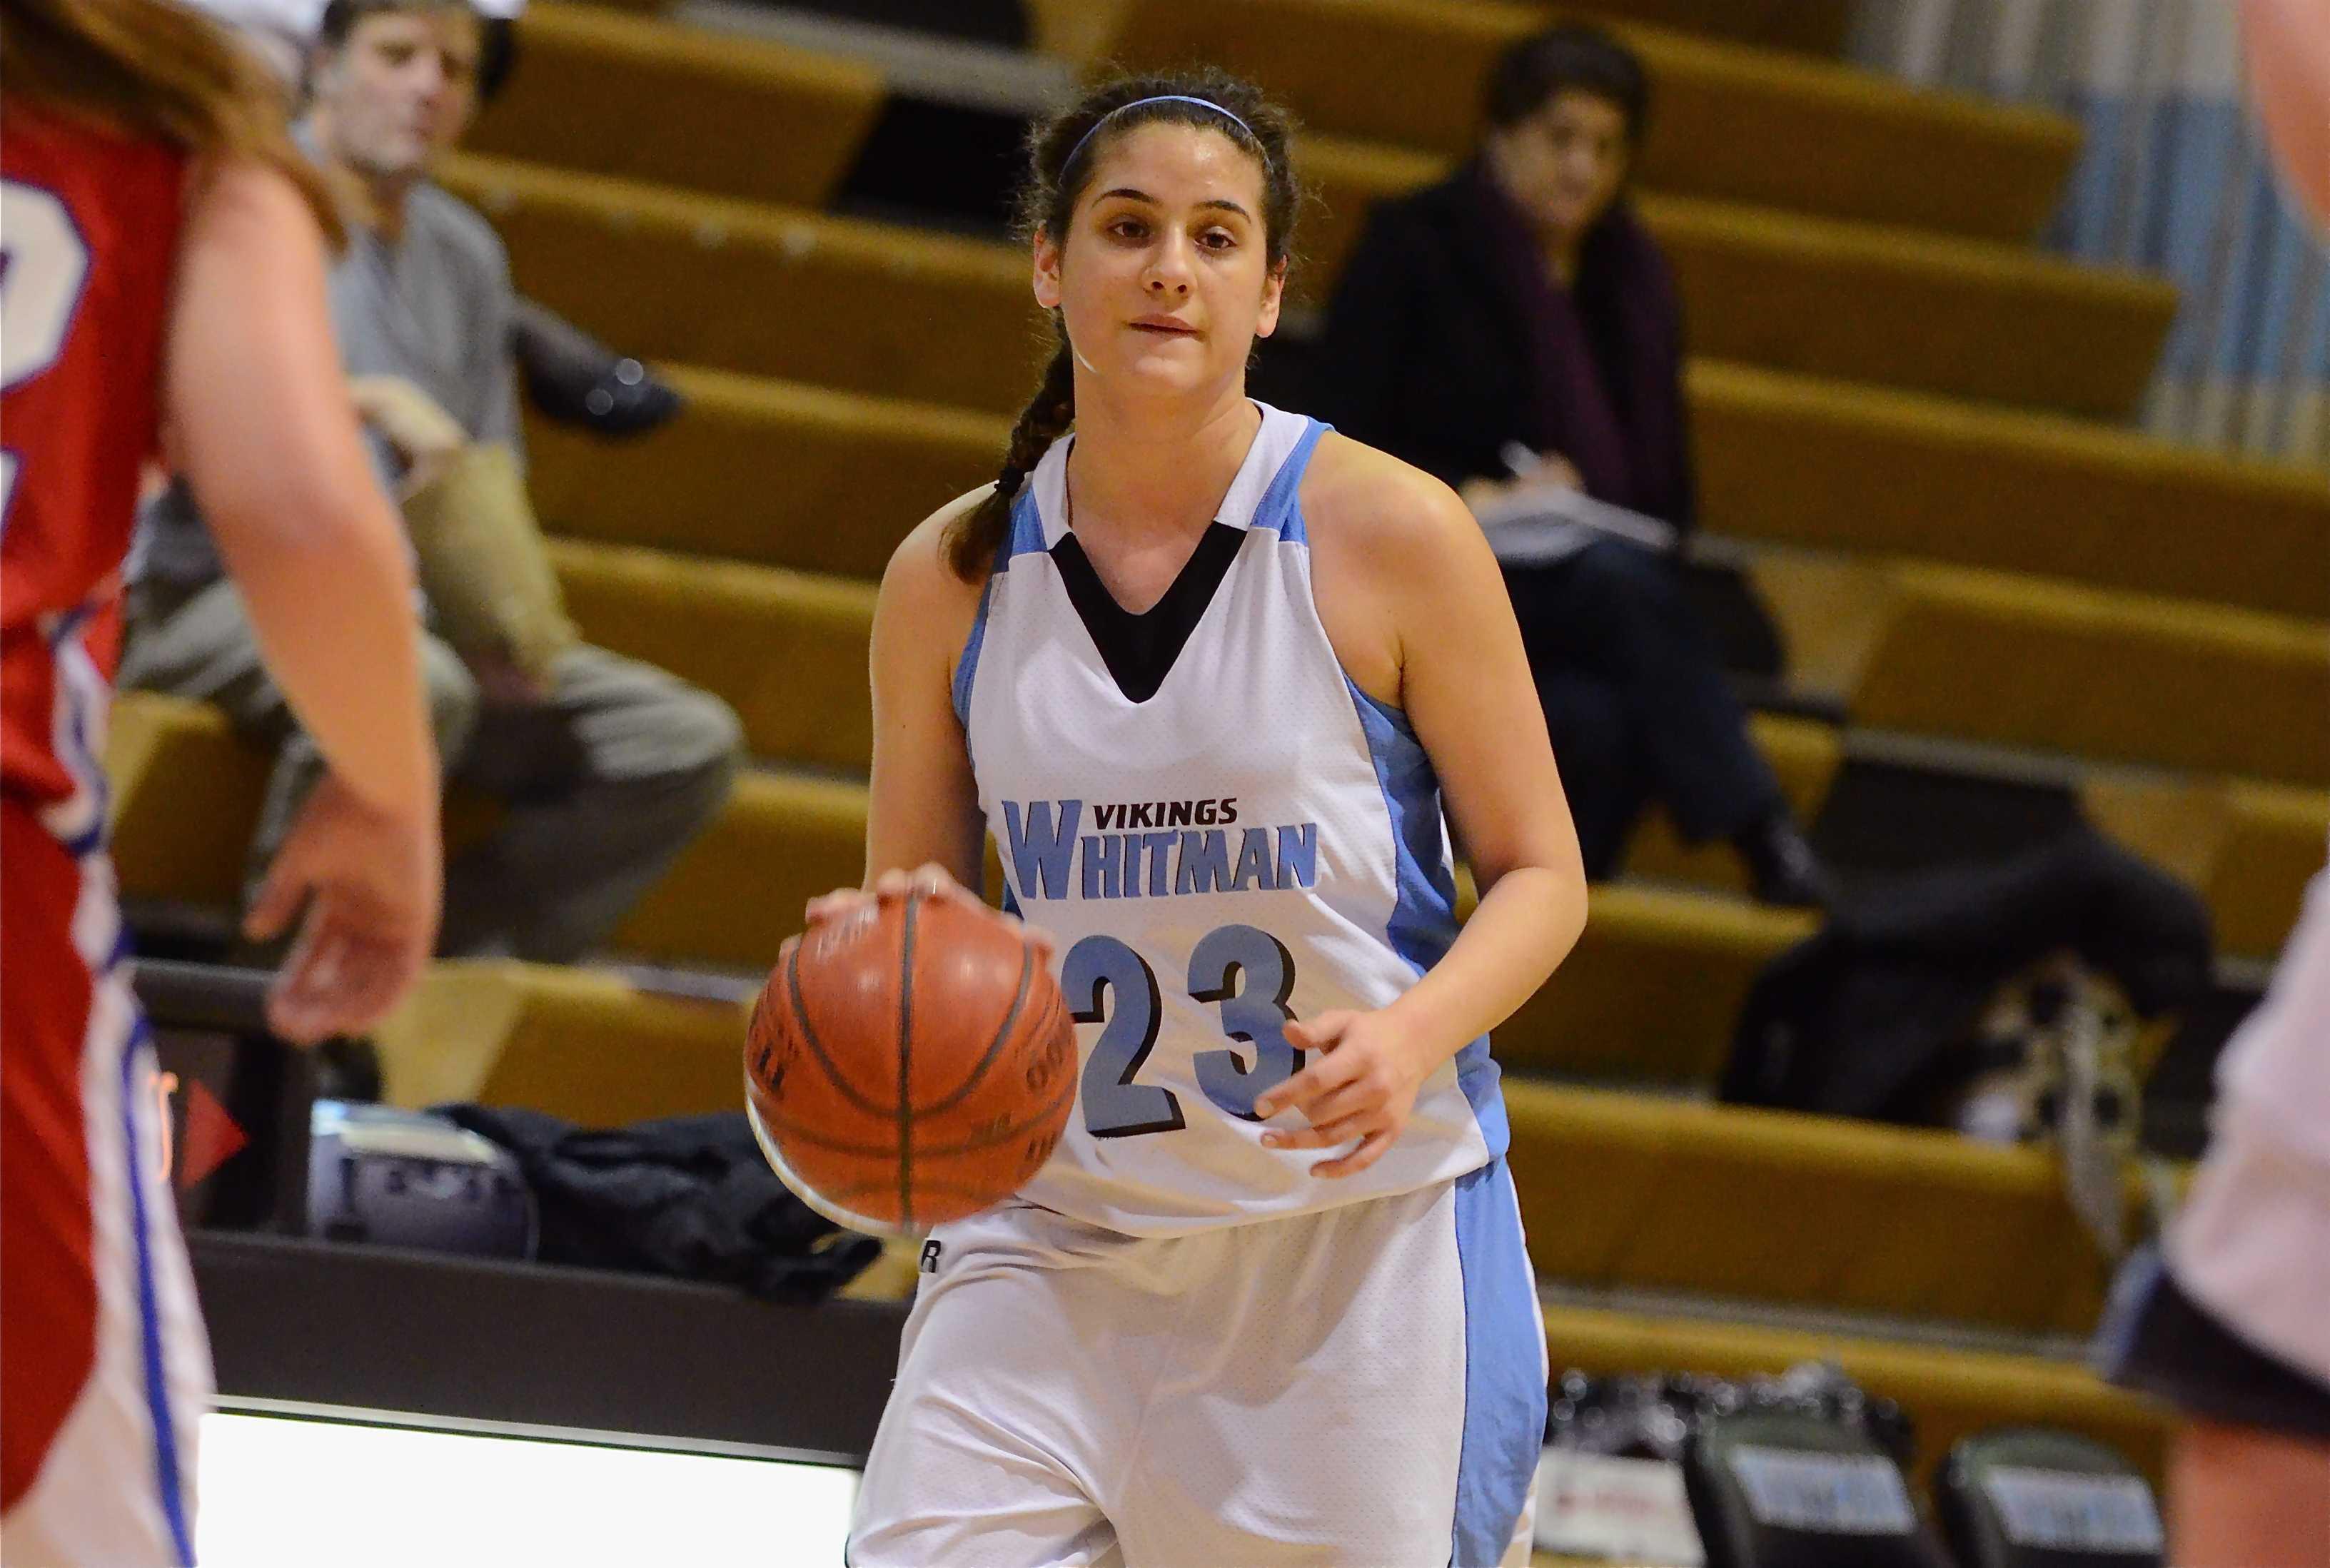 indsor girls basketball falls - HD3264×2197